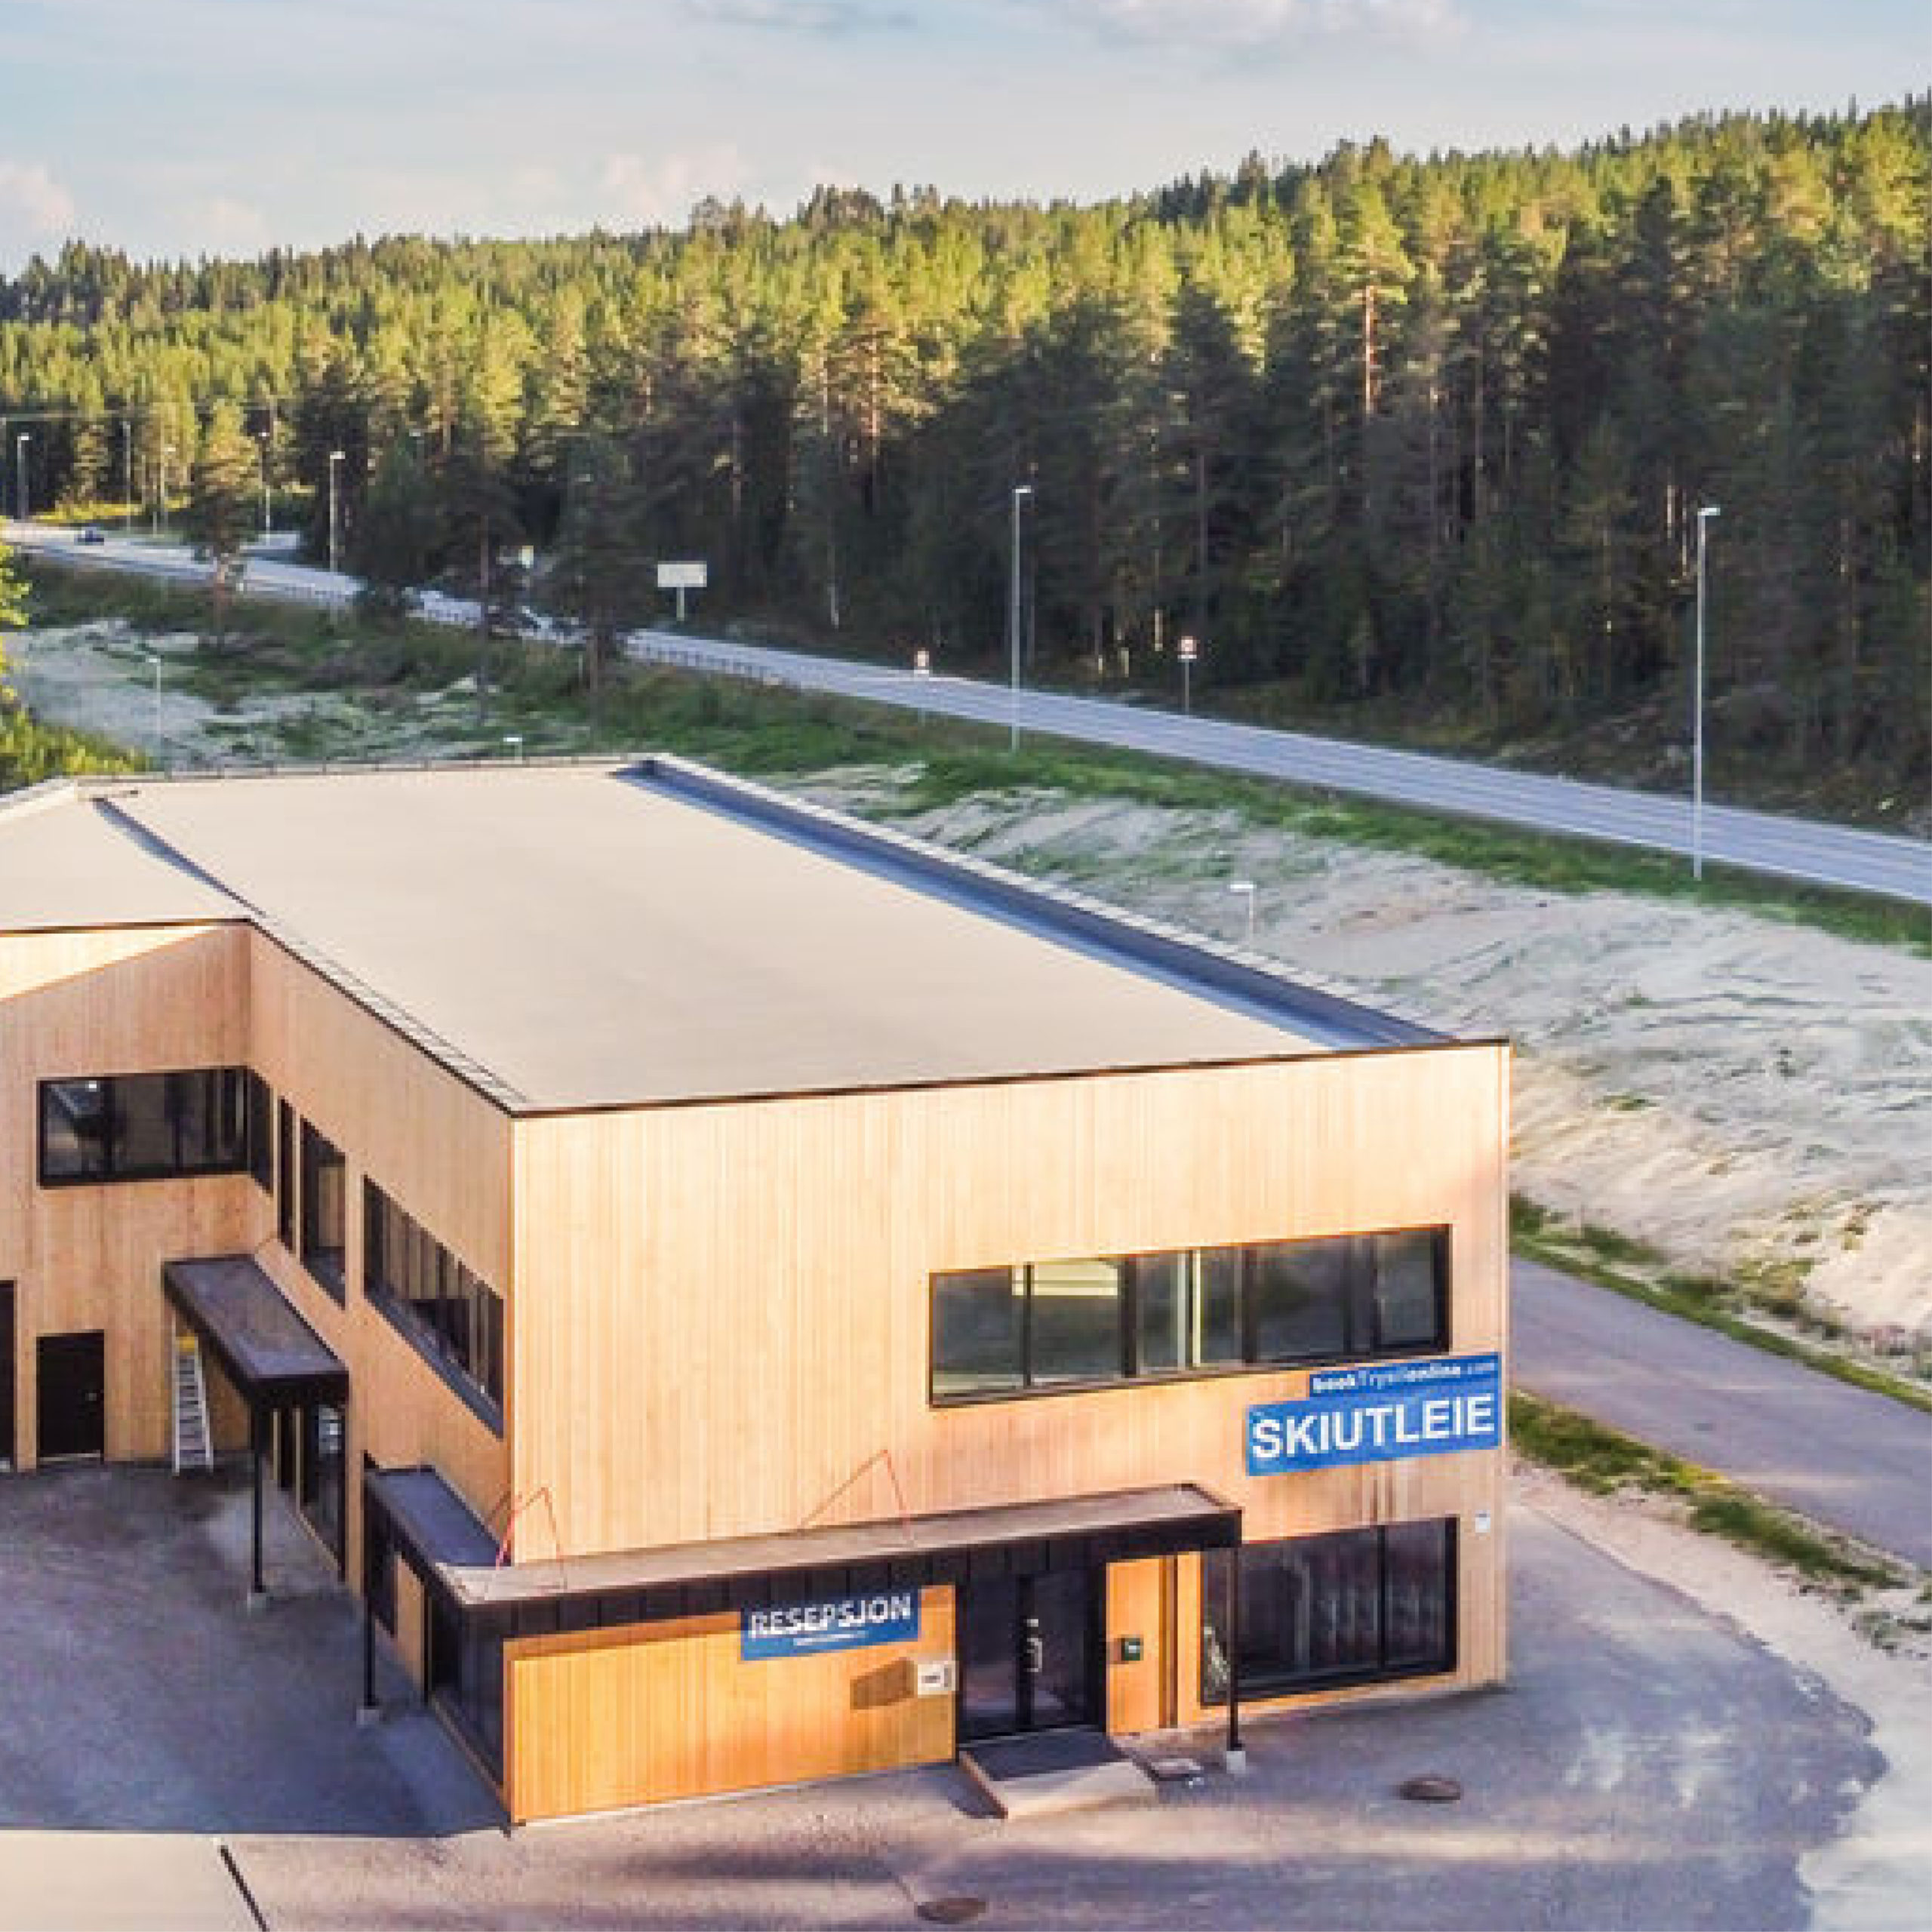 booktrysilonline ski rental and reception